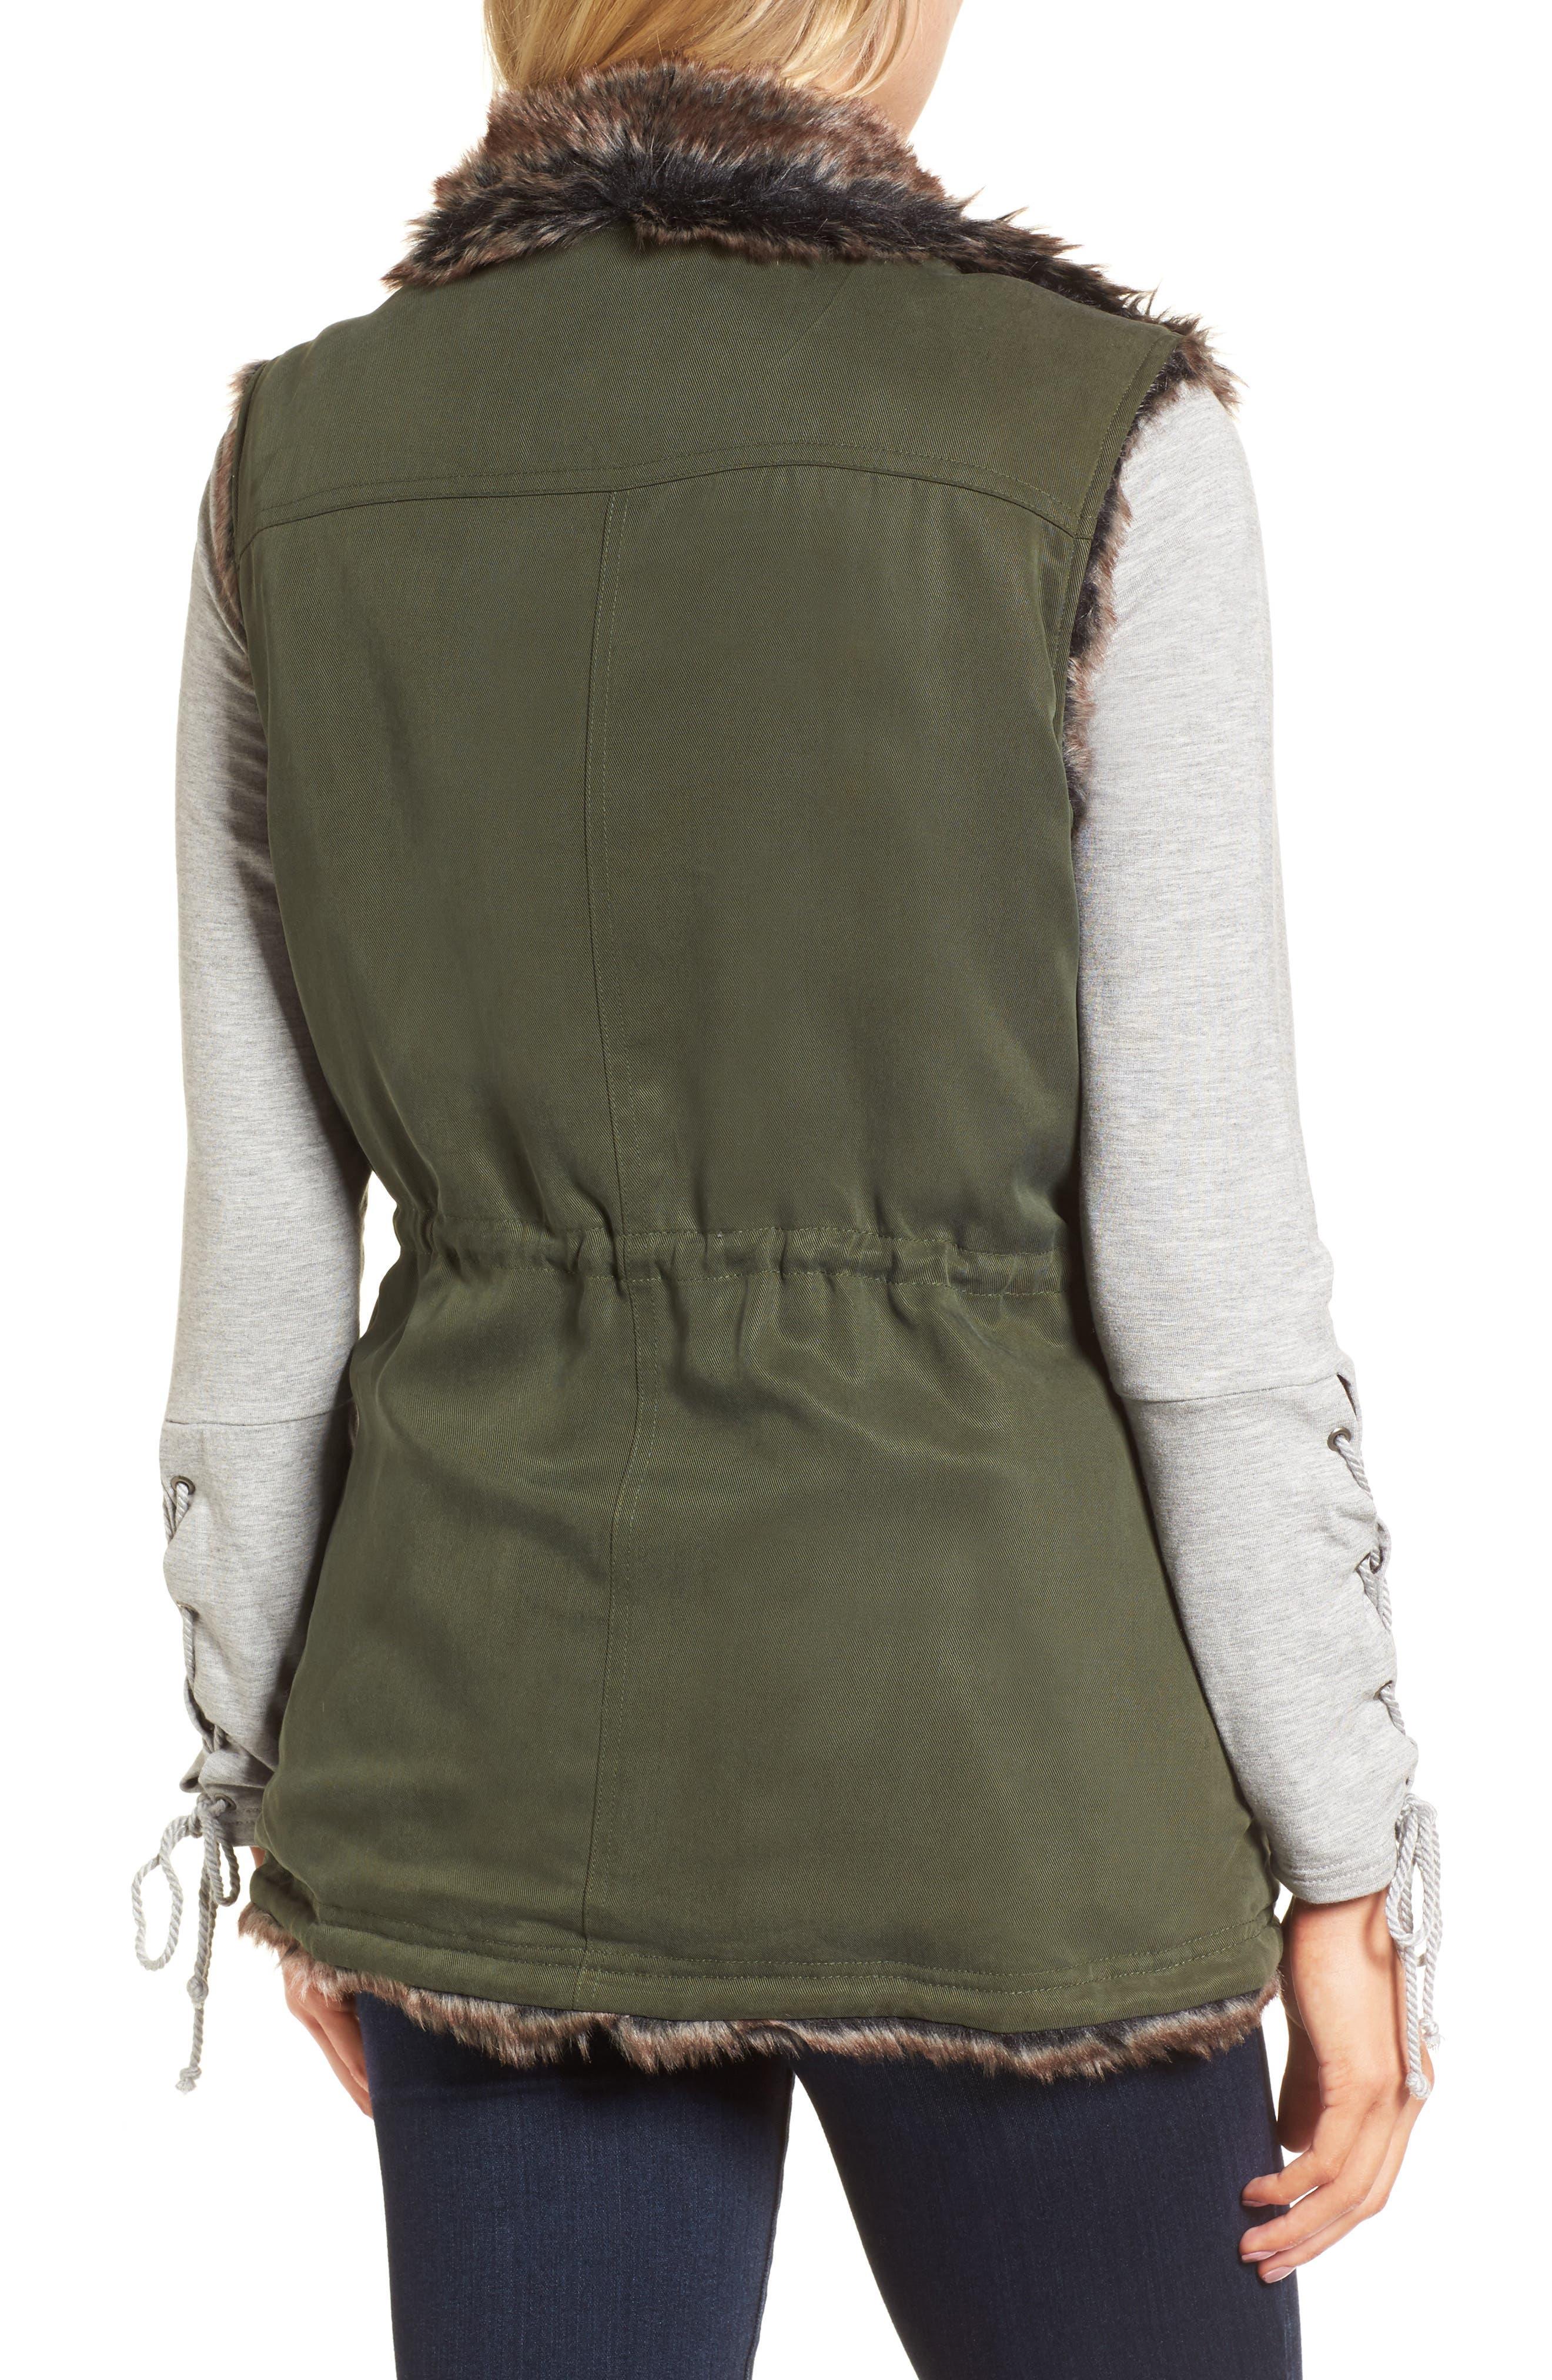 Ashling Faux Fur Lined Utility Vest,                             Alternate thumbnail 2, color,                             Army